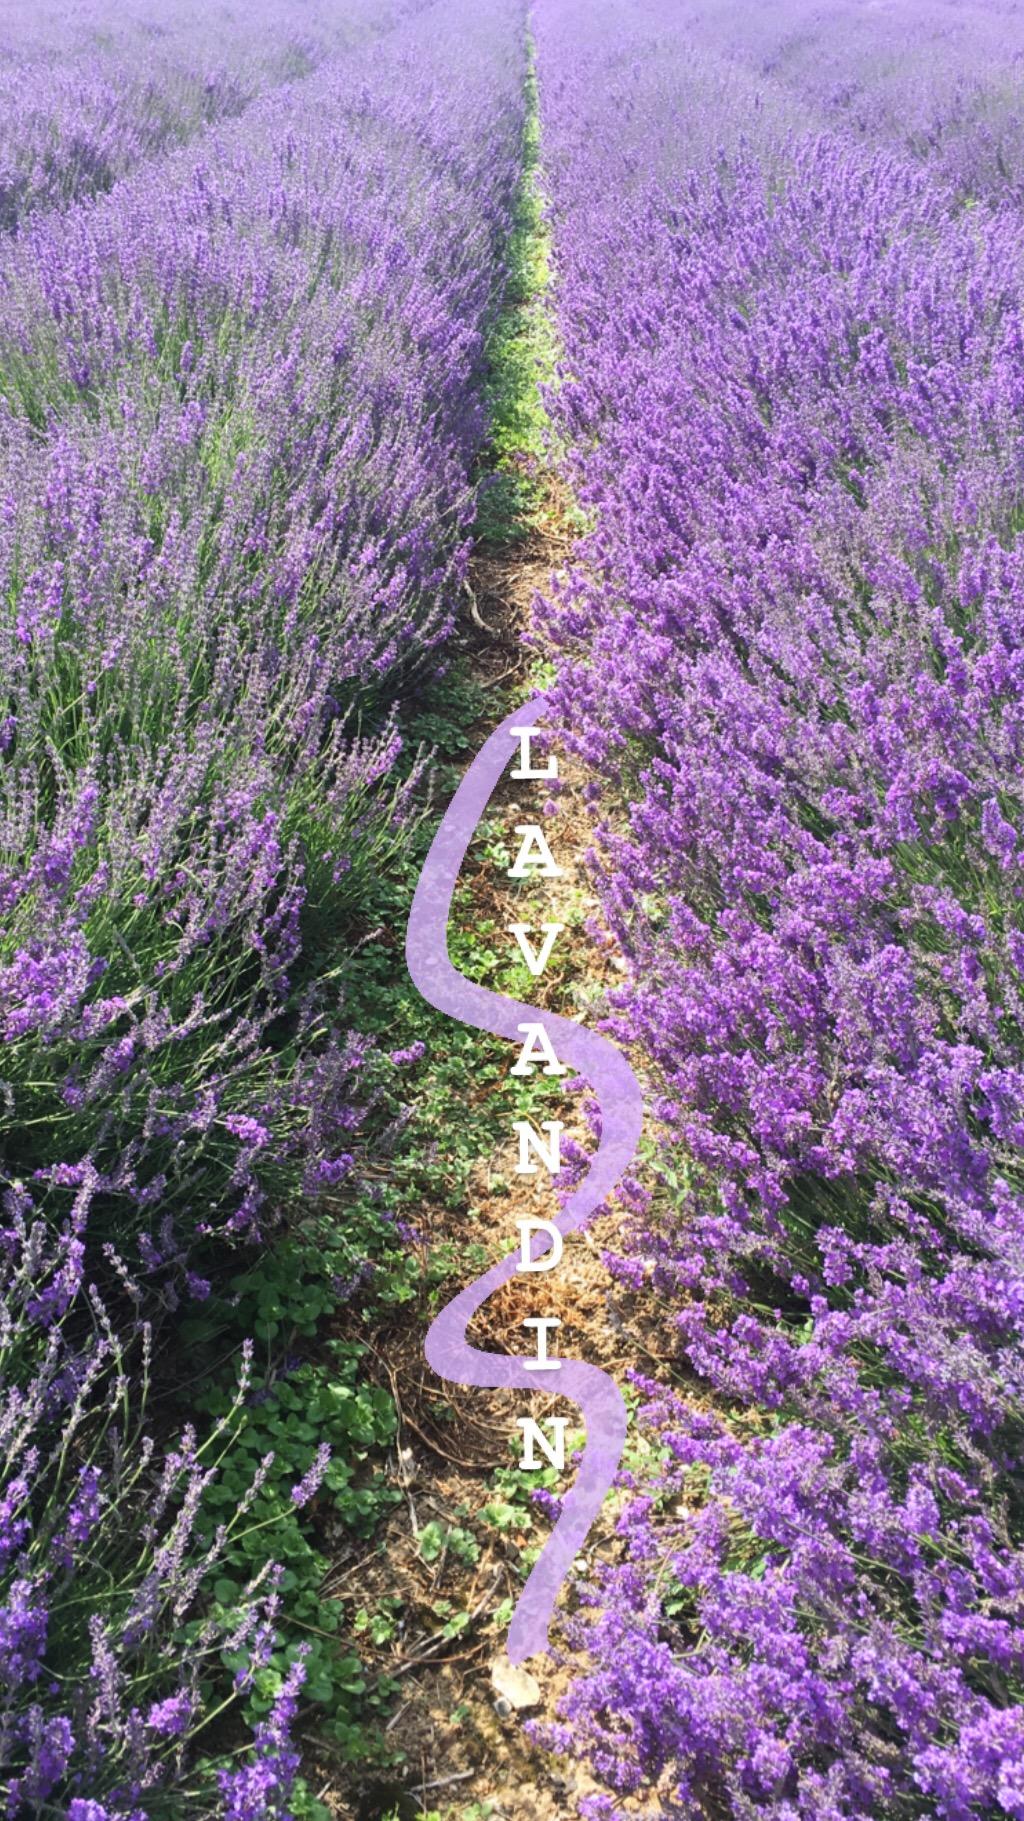 Lavender Hop Shop Castle Farm eileen hsieh follow that bug 8.JPG